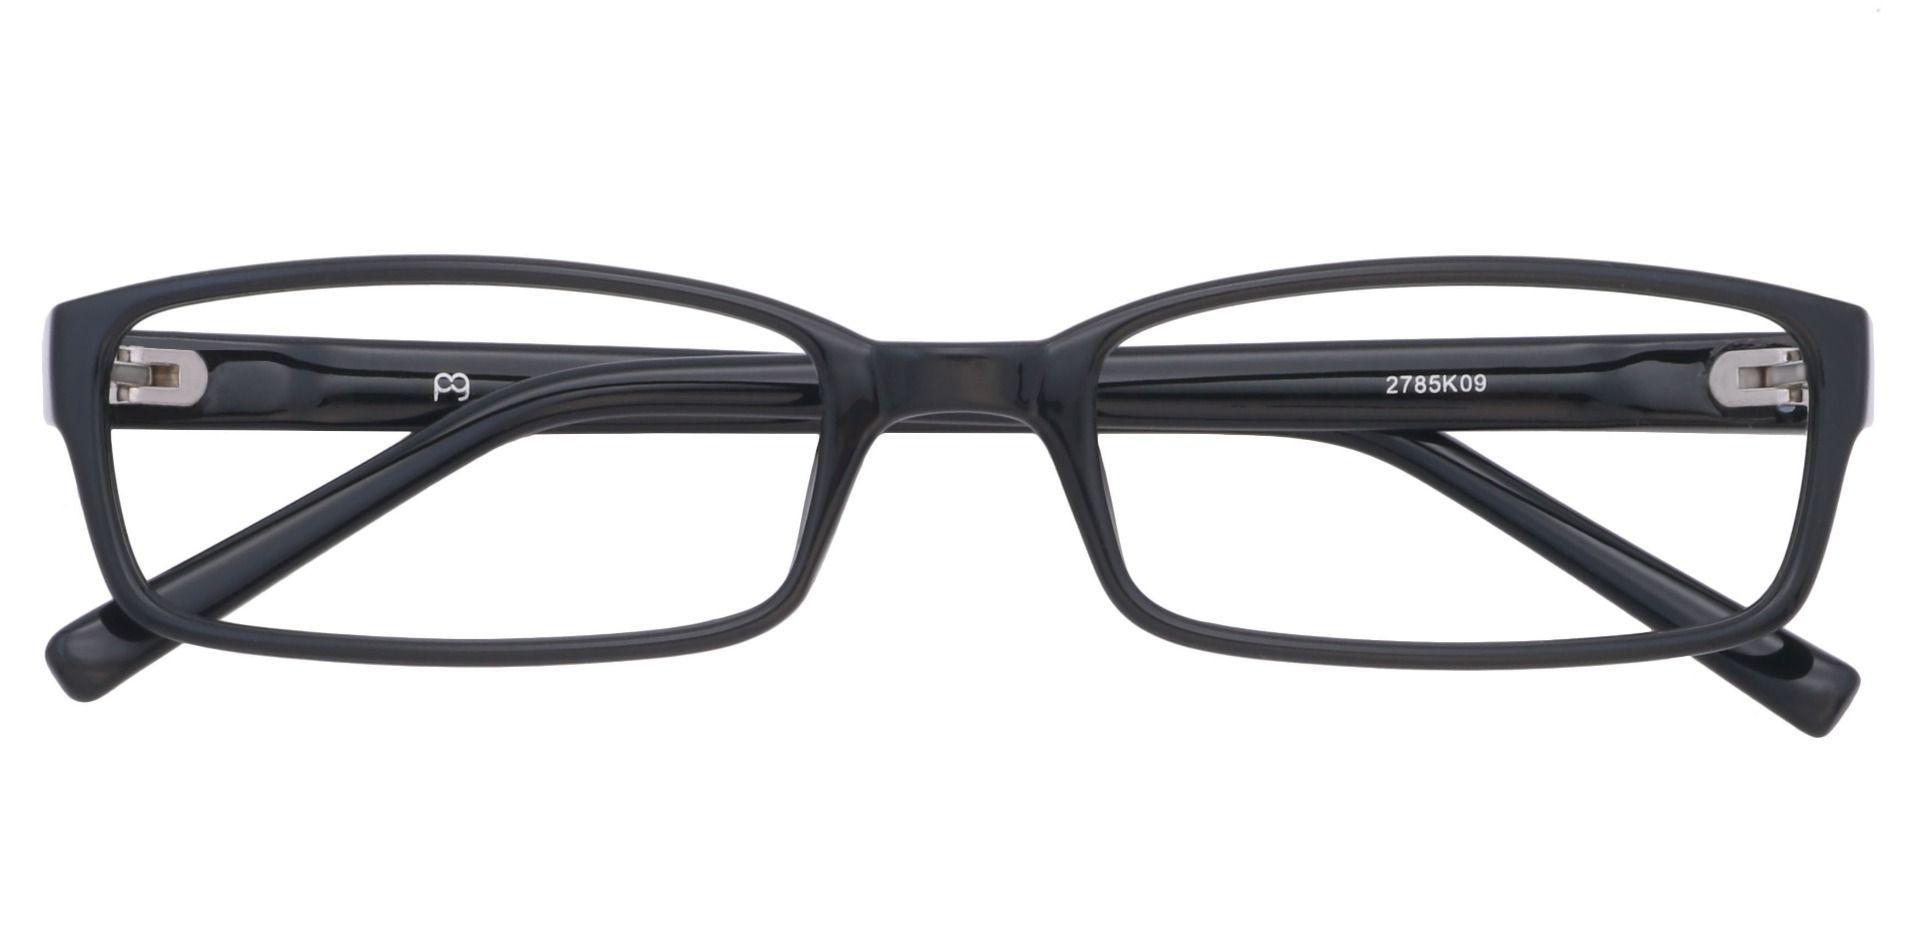 Sanford Rectangle Single Vision Glasses - Black